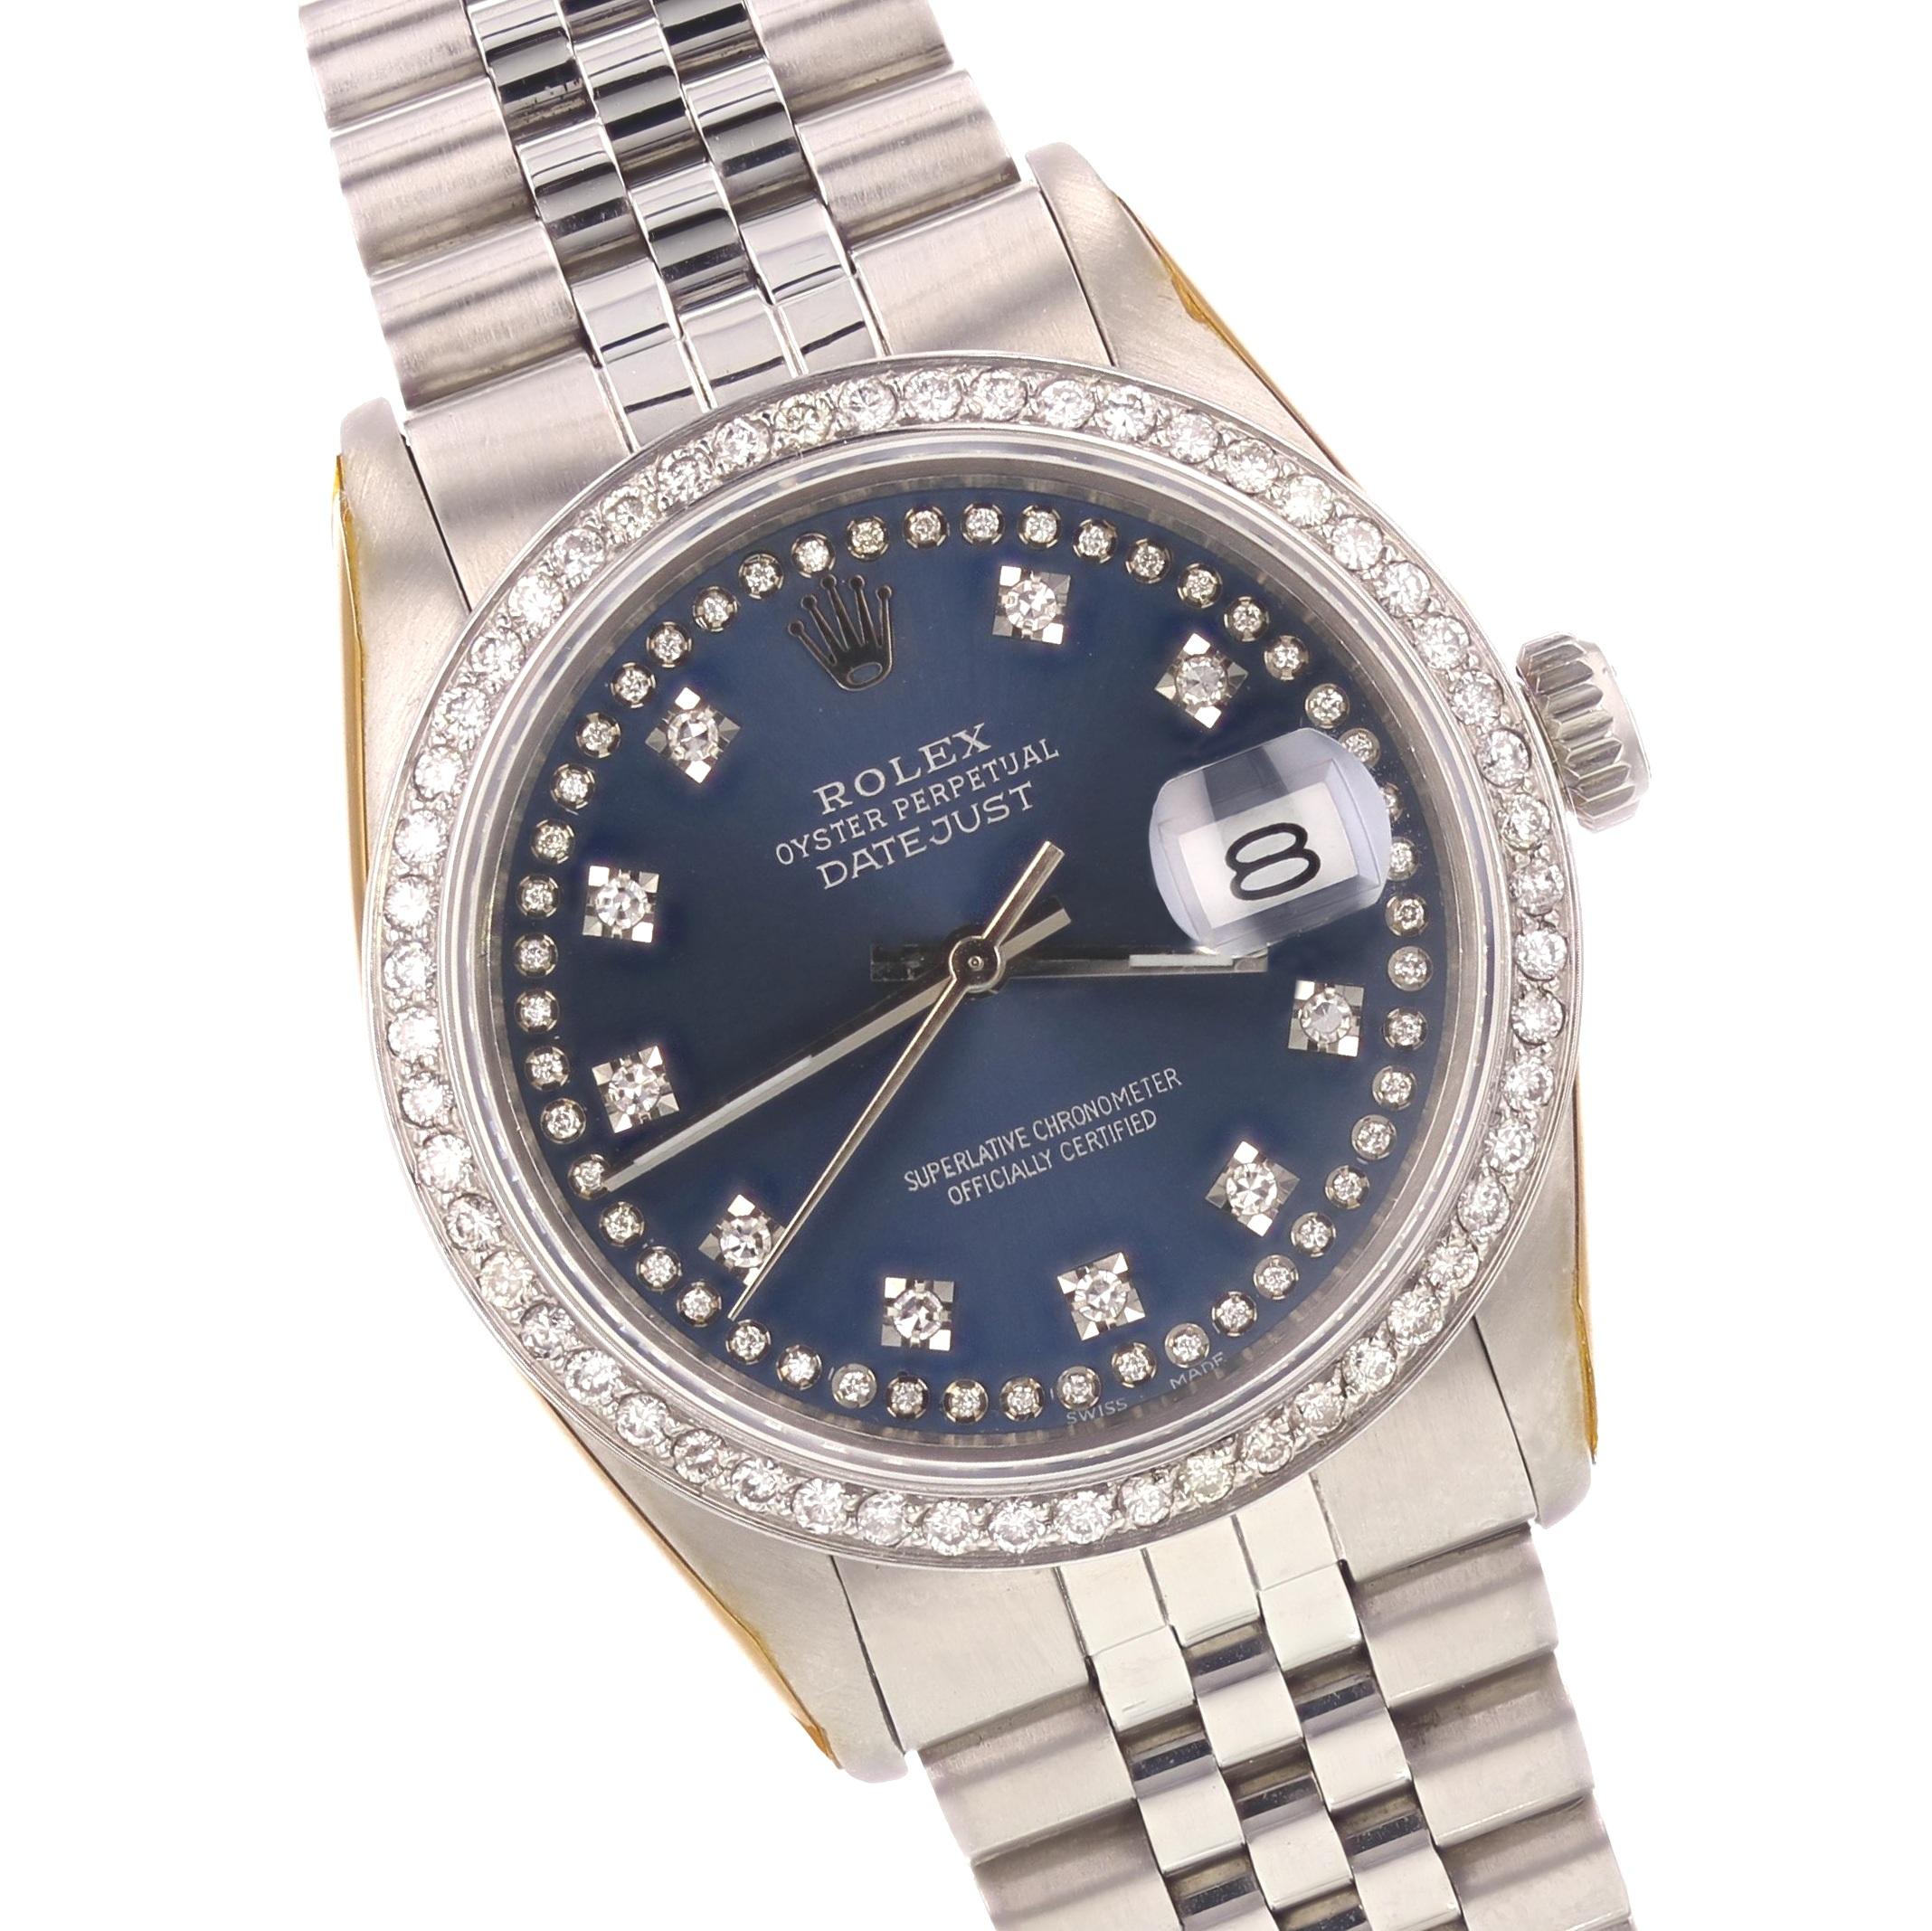 Rolex 18K White Gold/SS Datejust